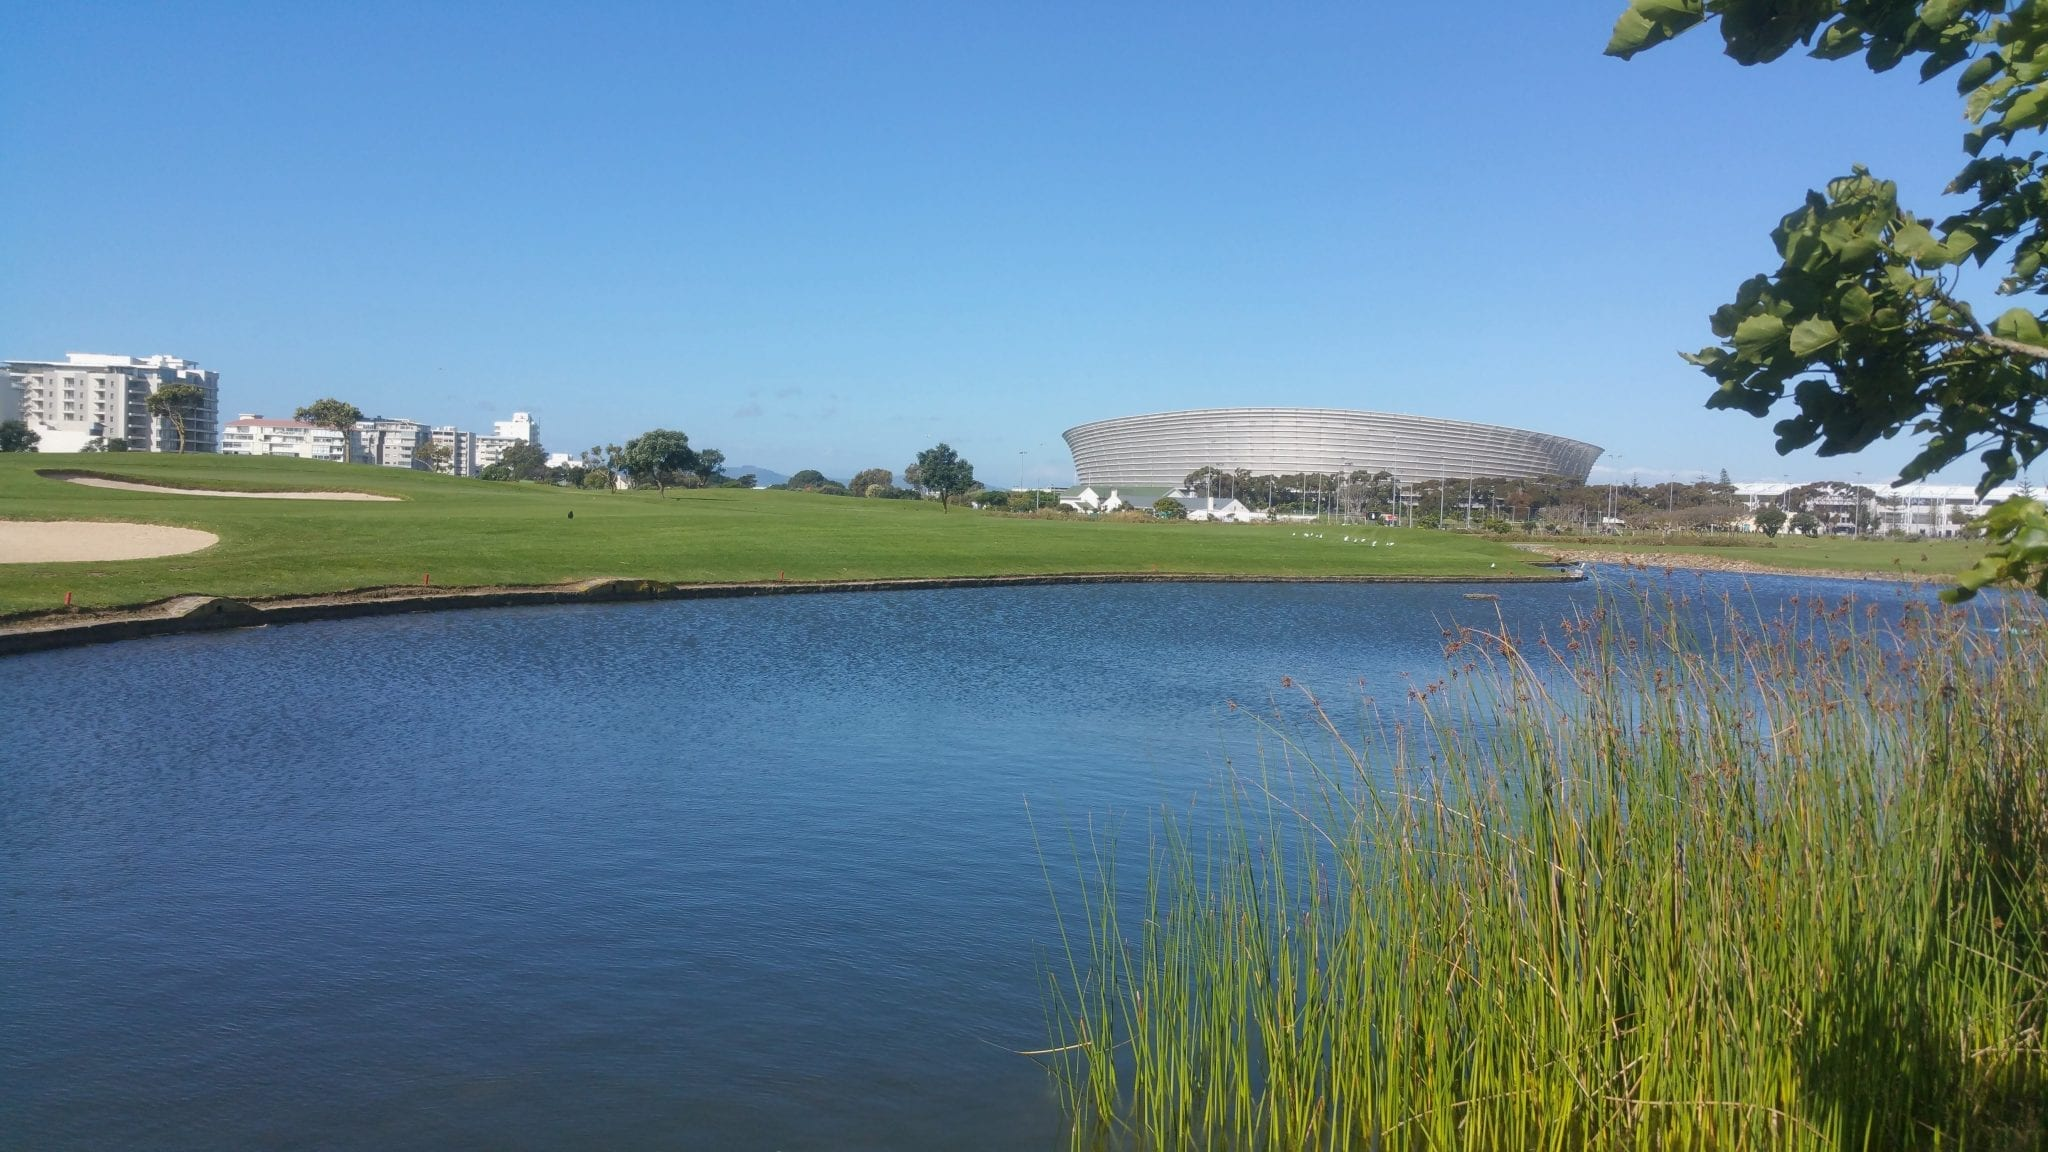 green-point-stadium-cape-town